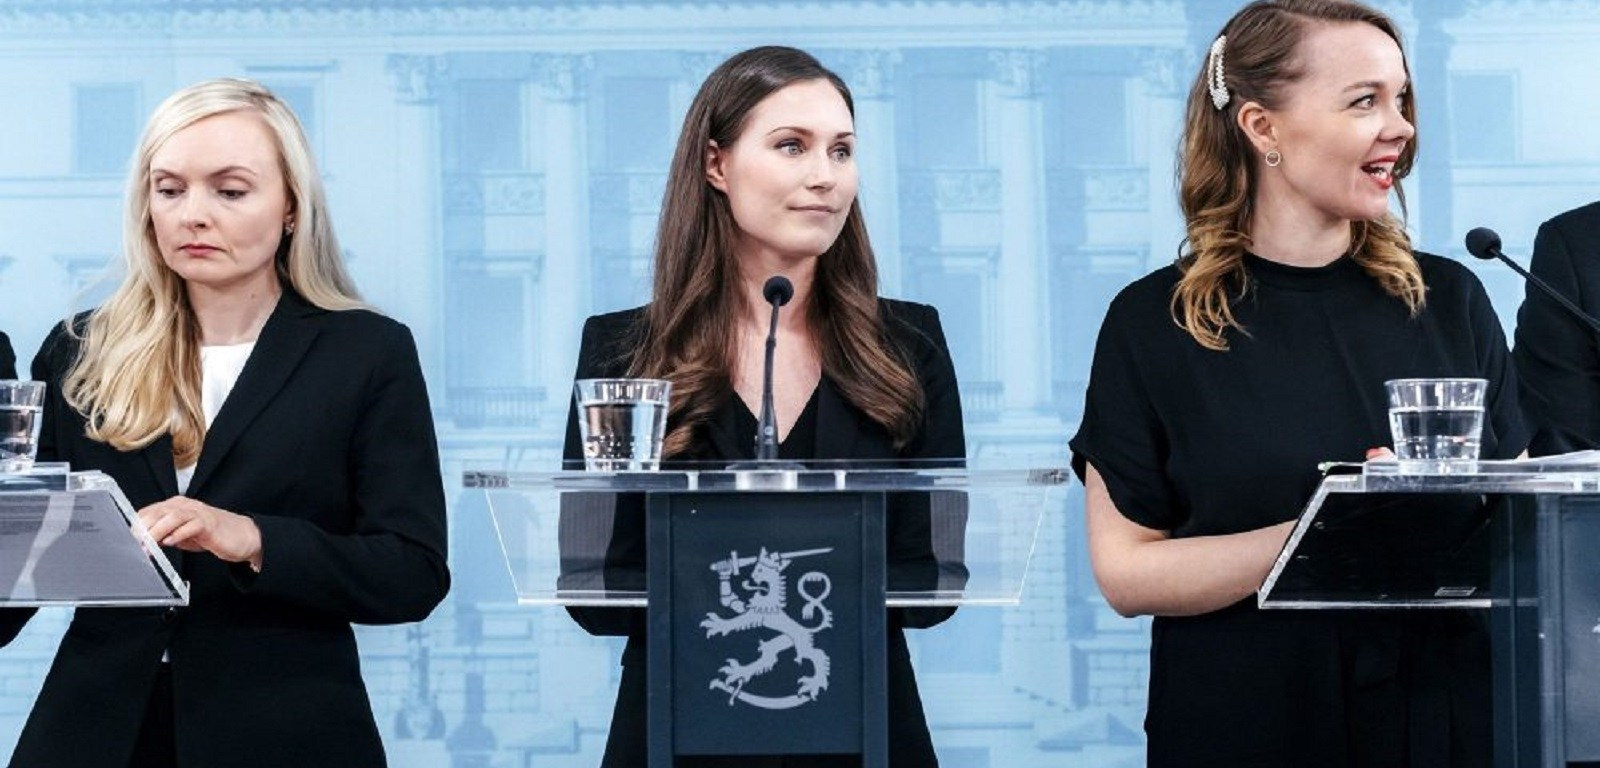 donne al potere - sanna marin